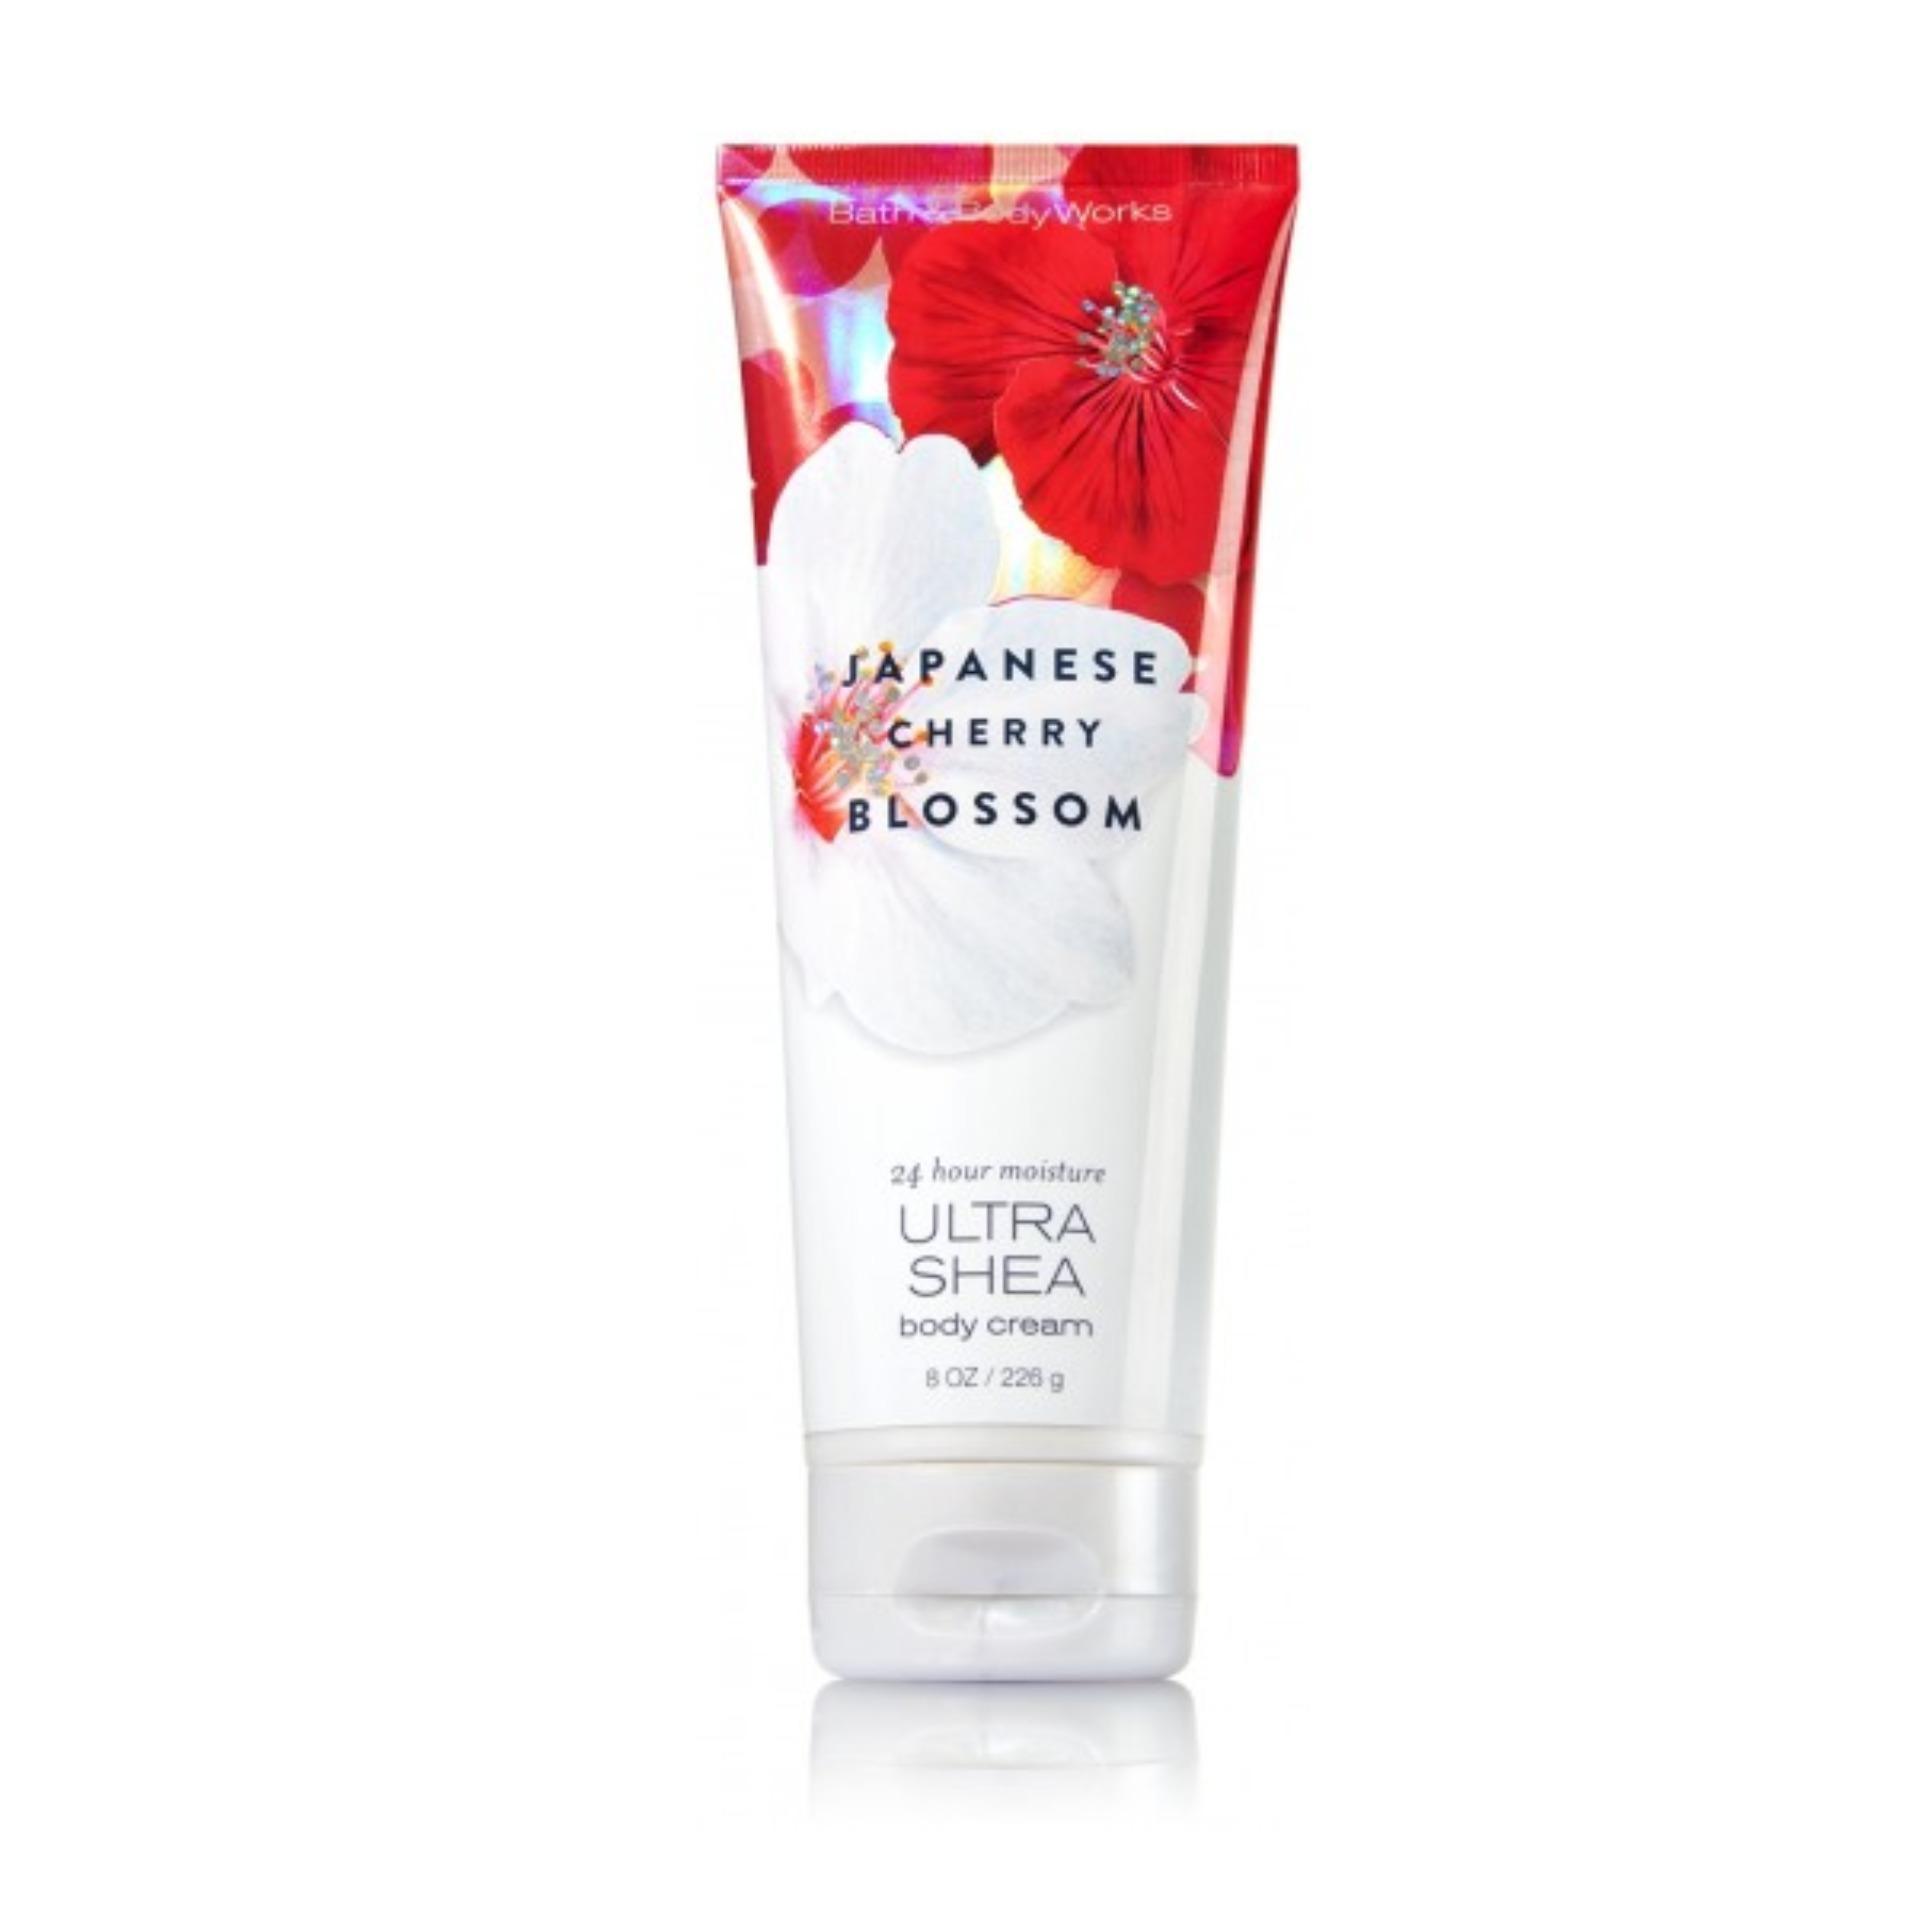 Sữa dưỡng thể Bath&Body Works Cherry Blossom 24h Utra Shea Body Cream 226g nhập khẩu